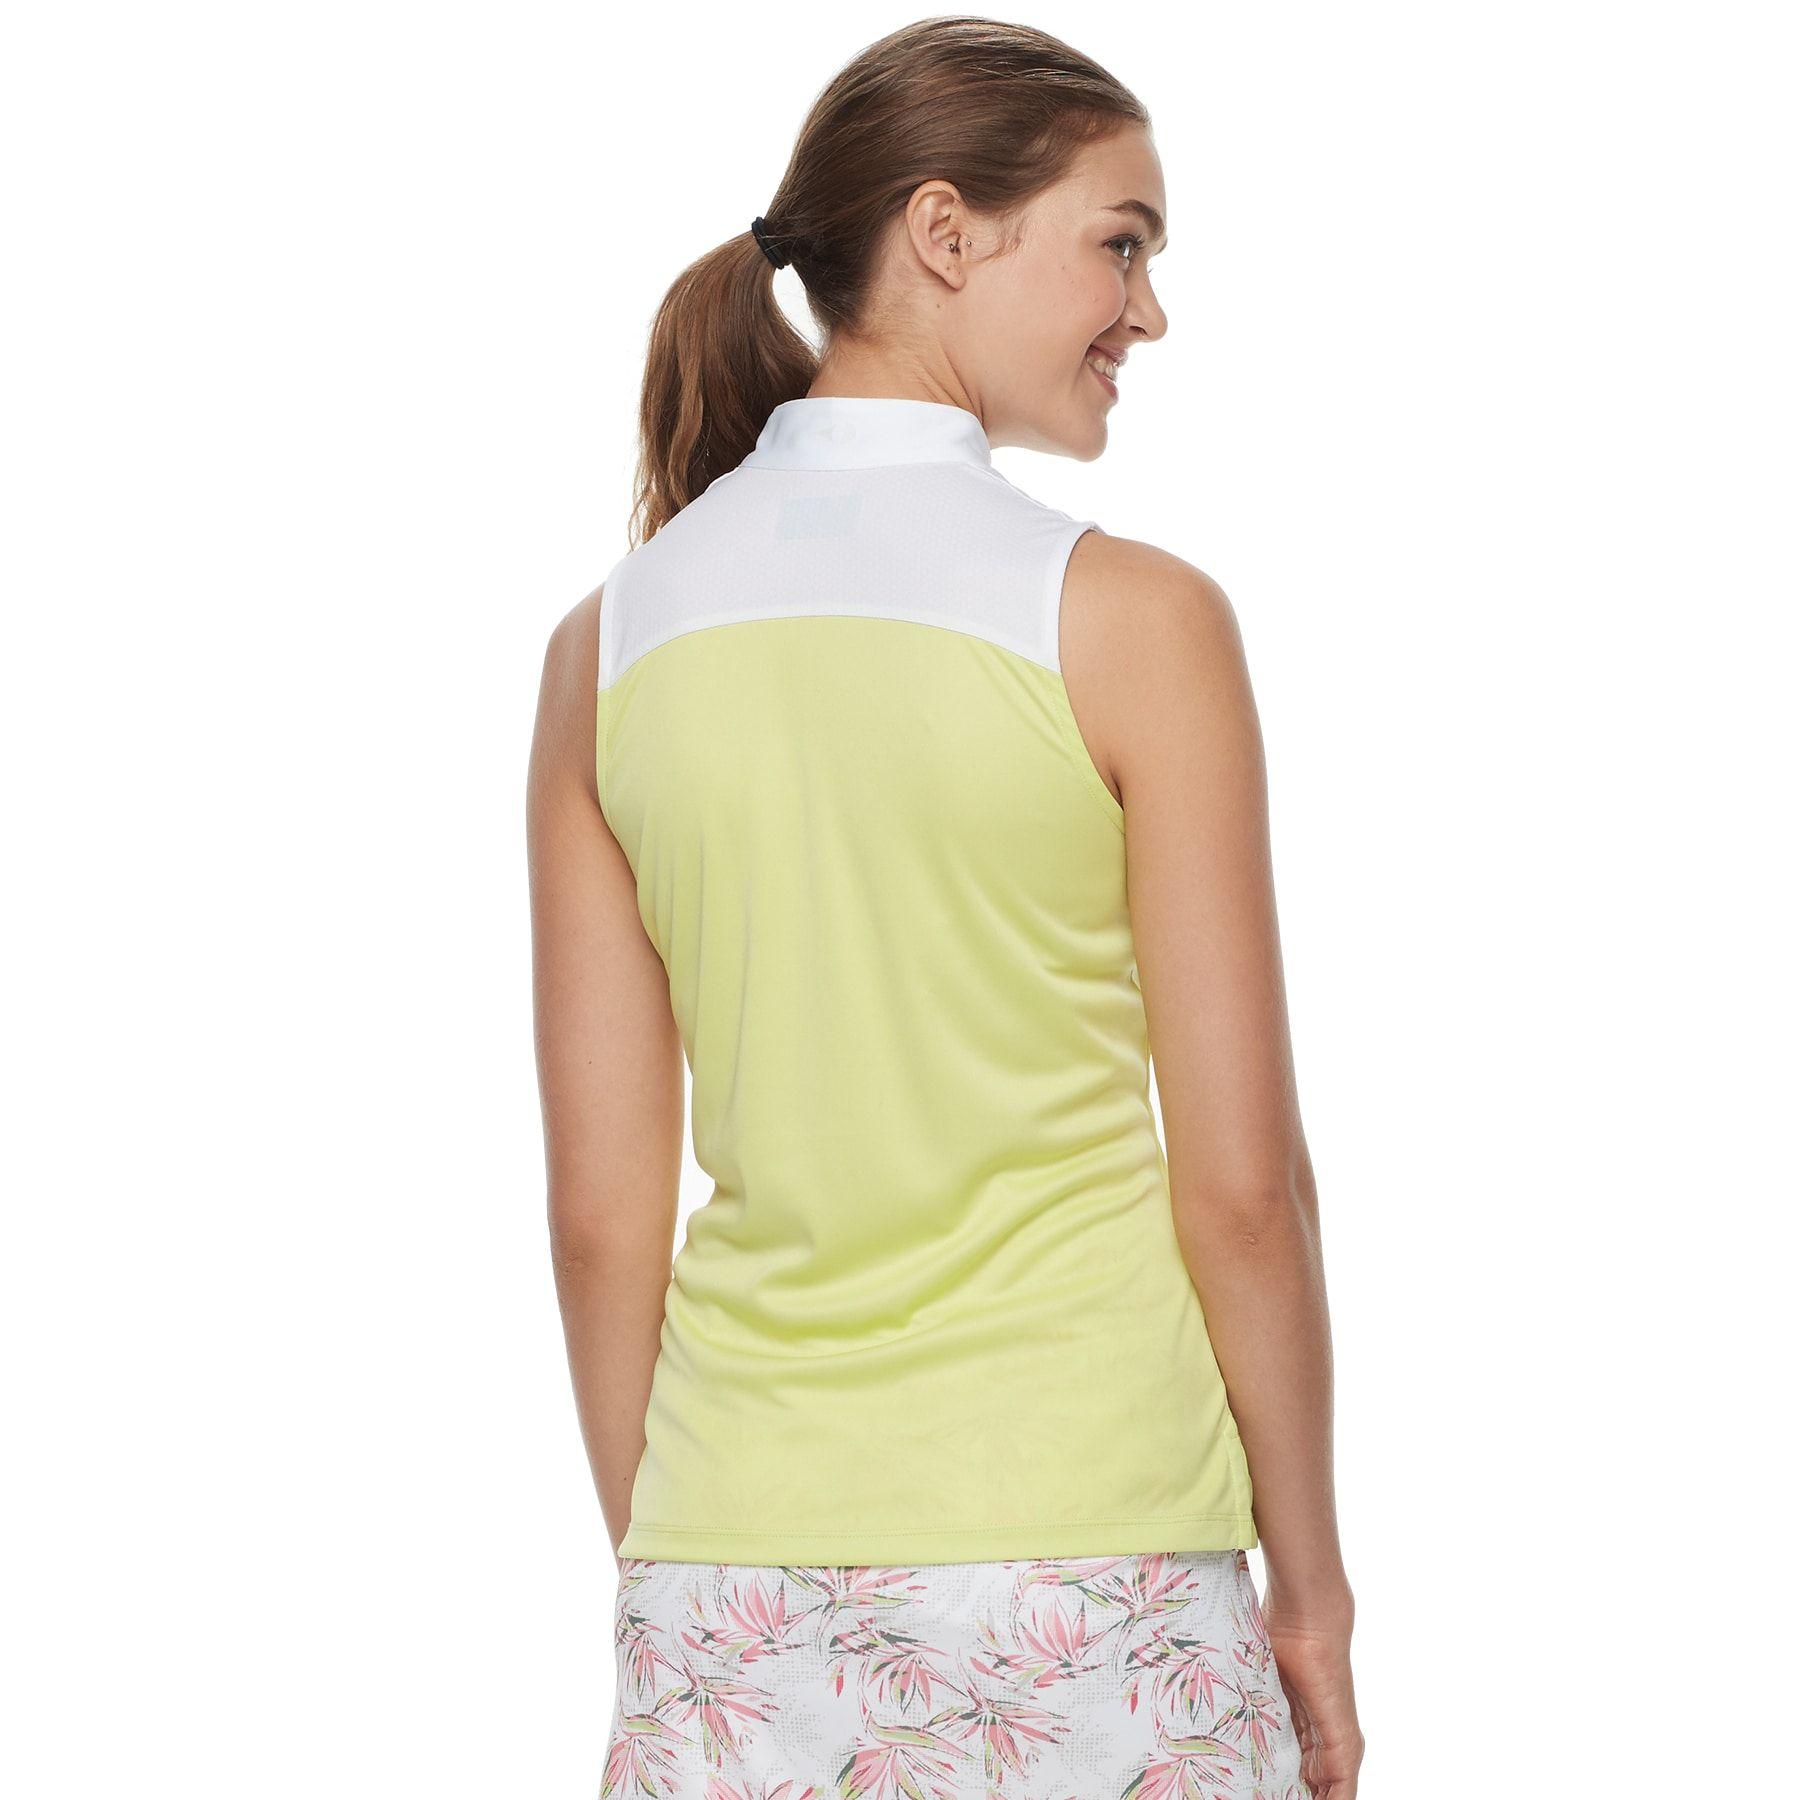 483a6327431f7 Women u0027s Grand Slam Color Block Sleeveless Golf Top